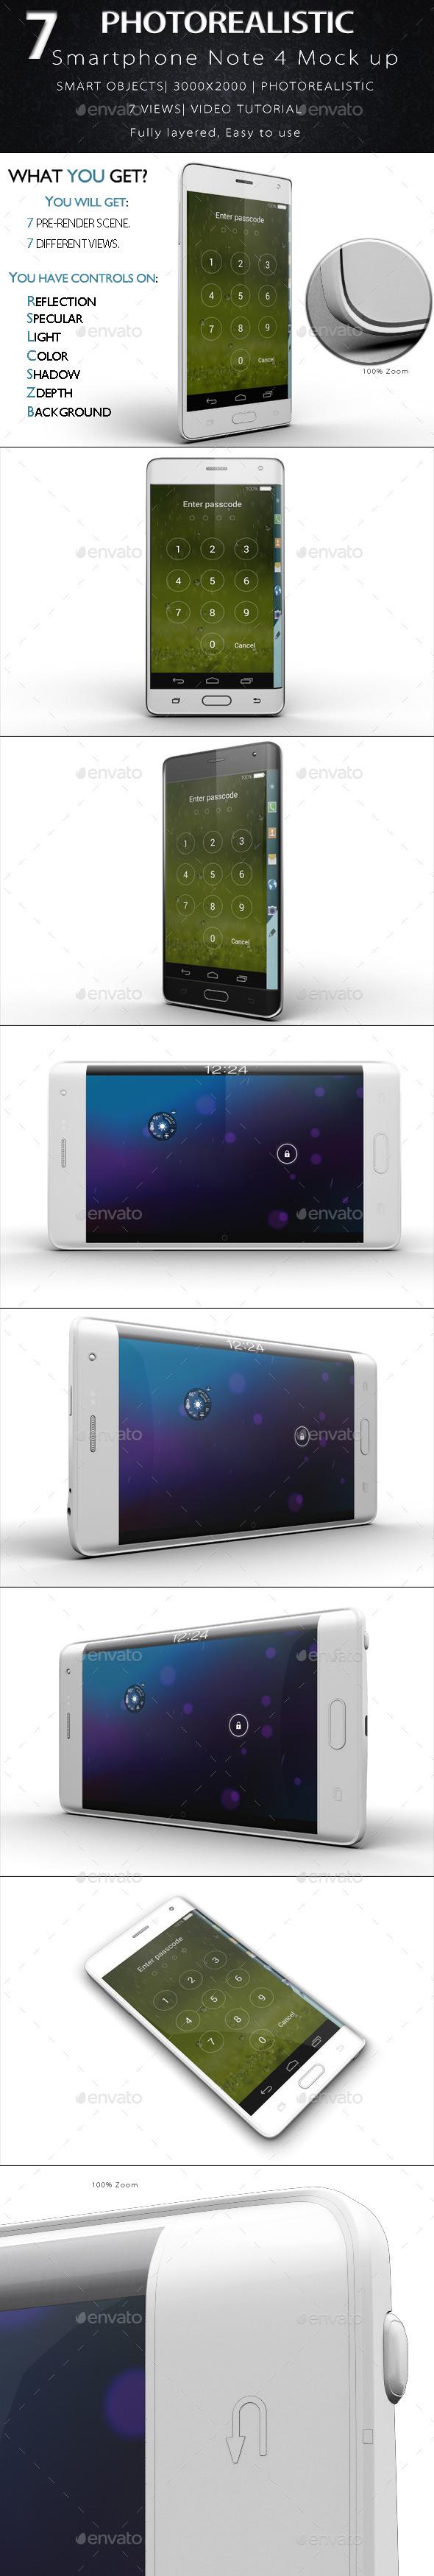 GraphicRiver Galaxy Note Edge Smartphone Mock Up 11893846